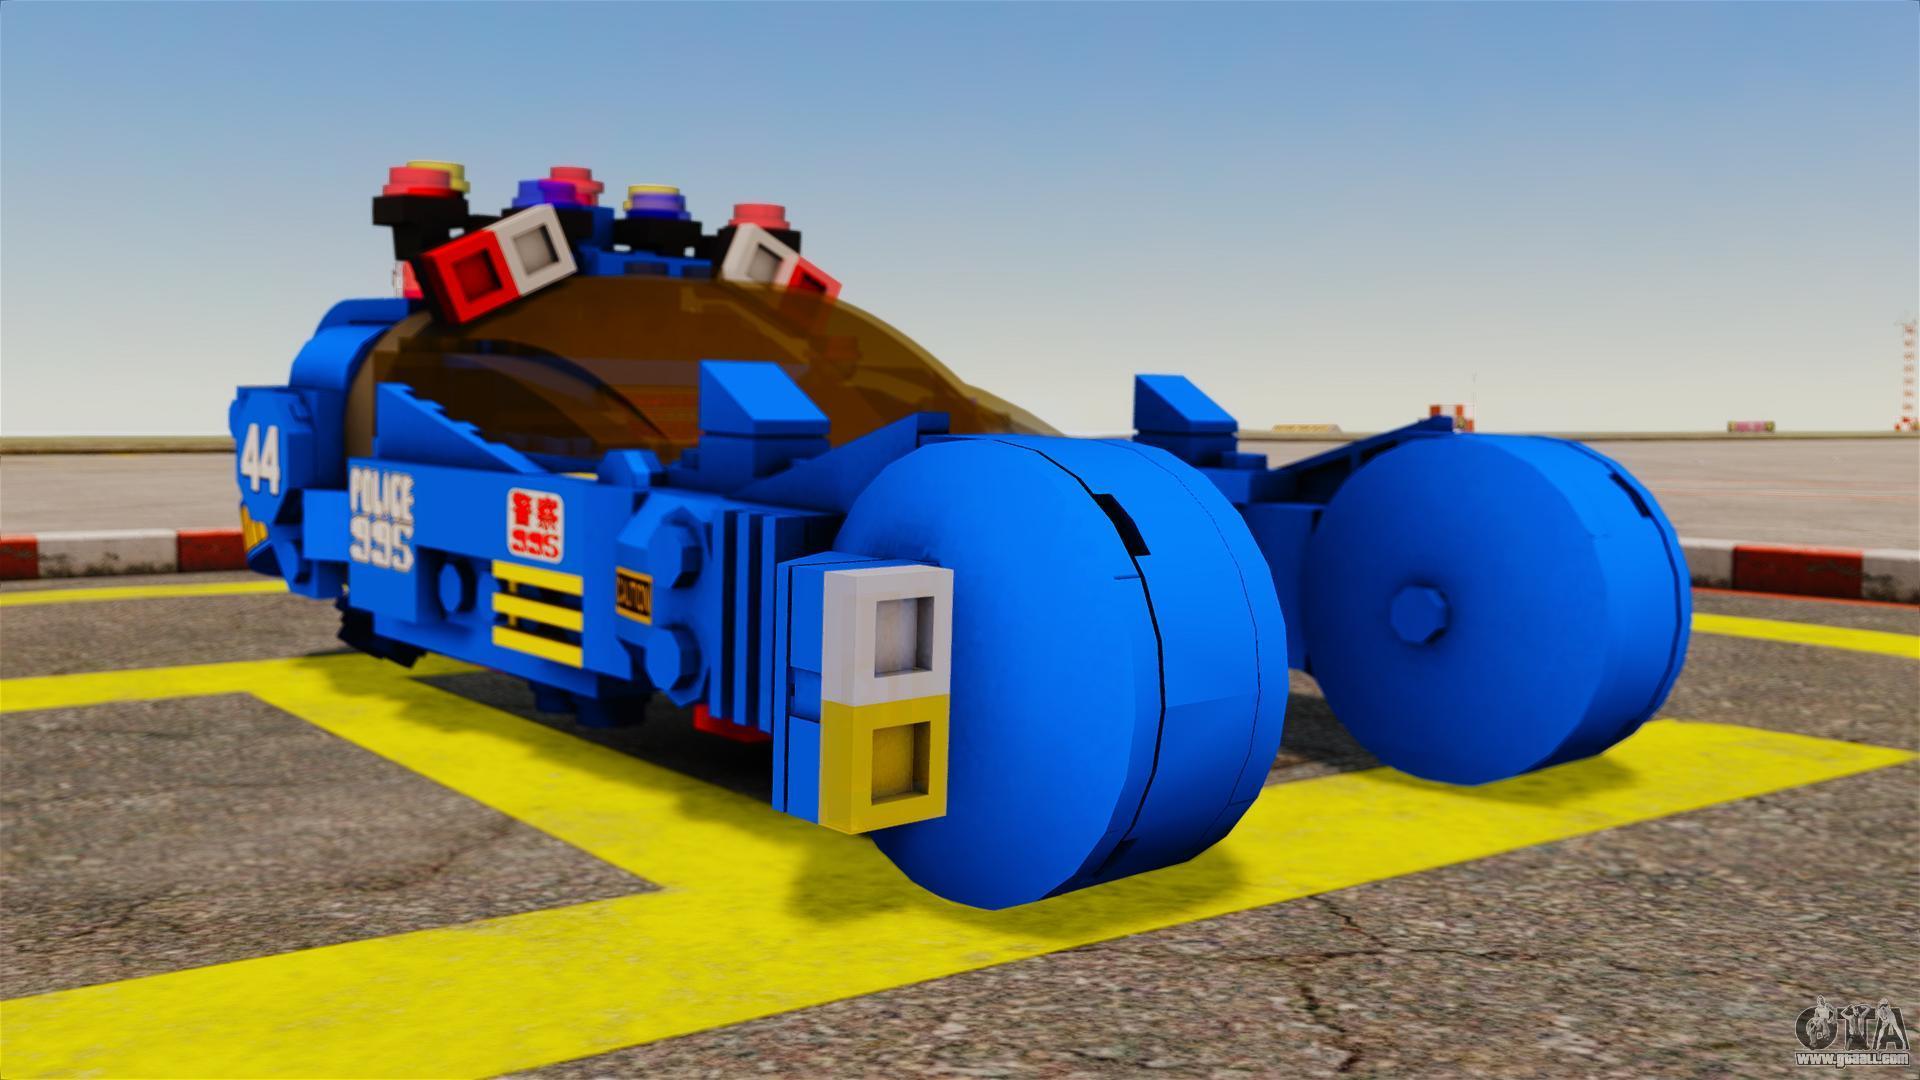 Lego gta 5 ps3